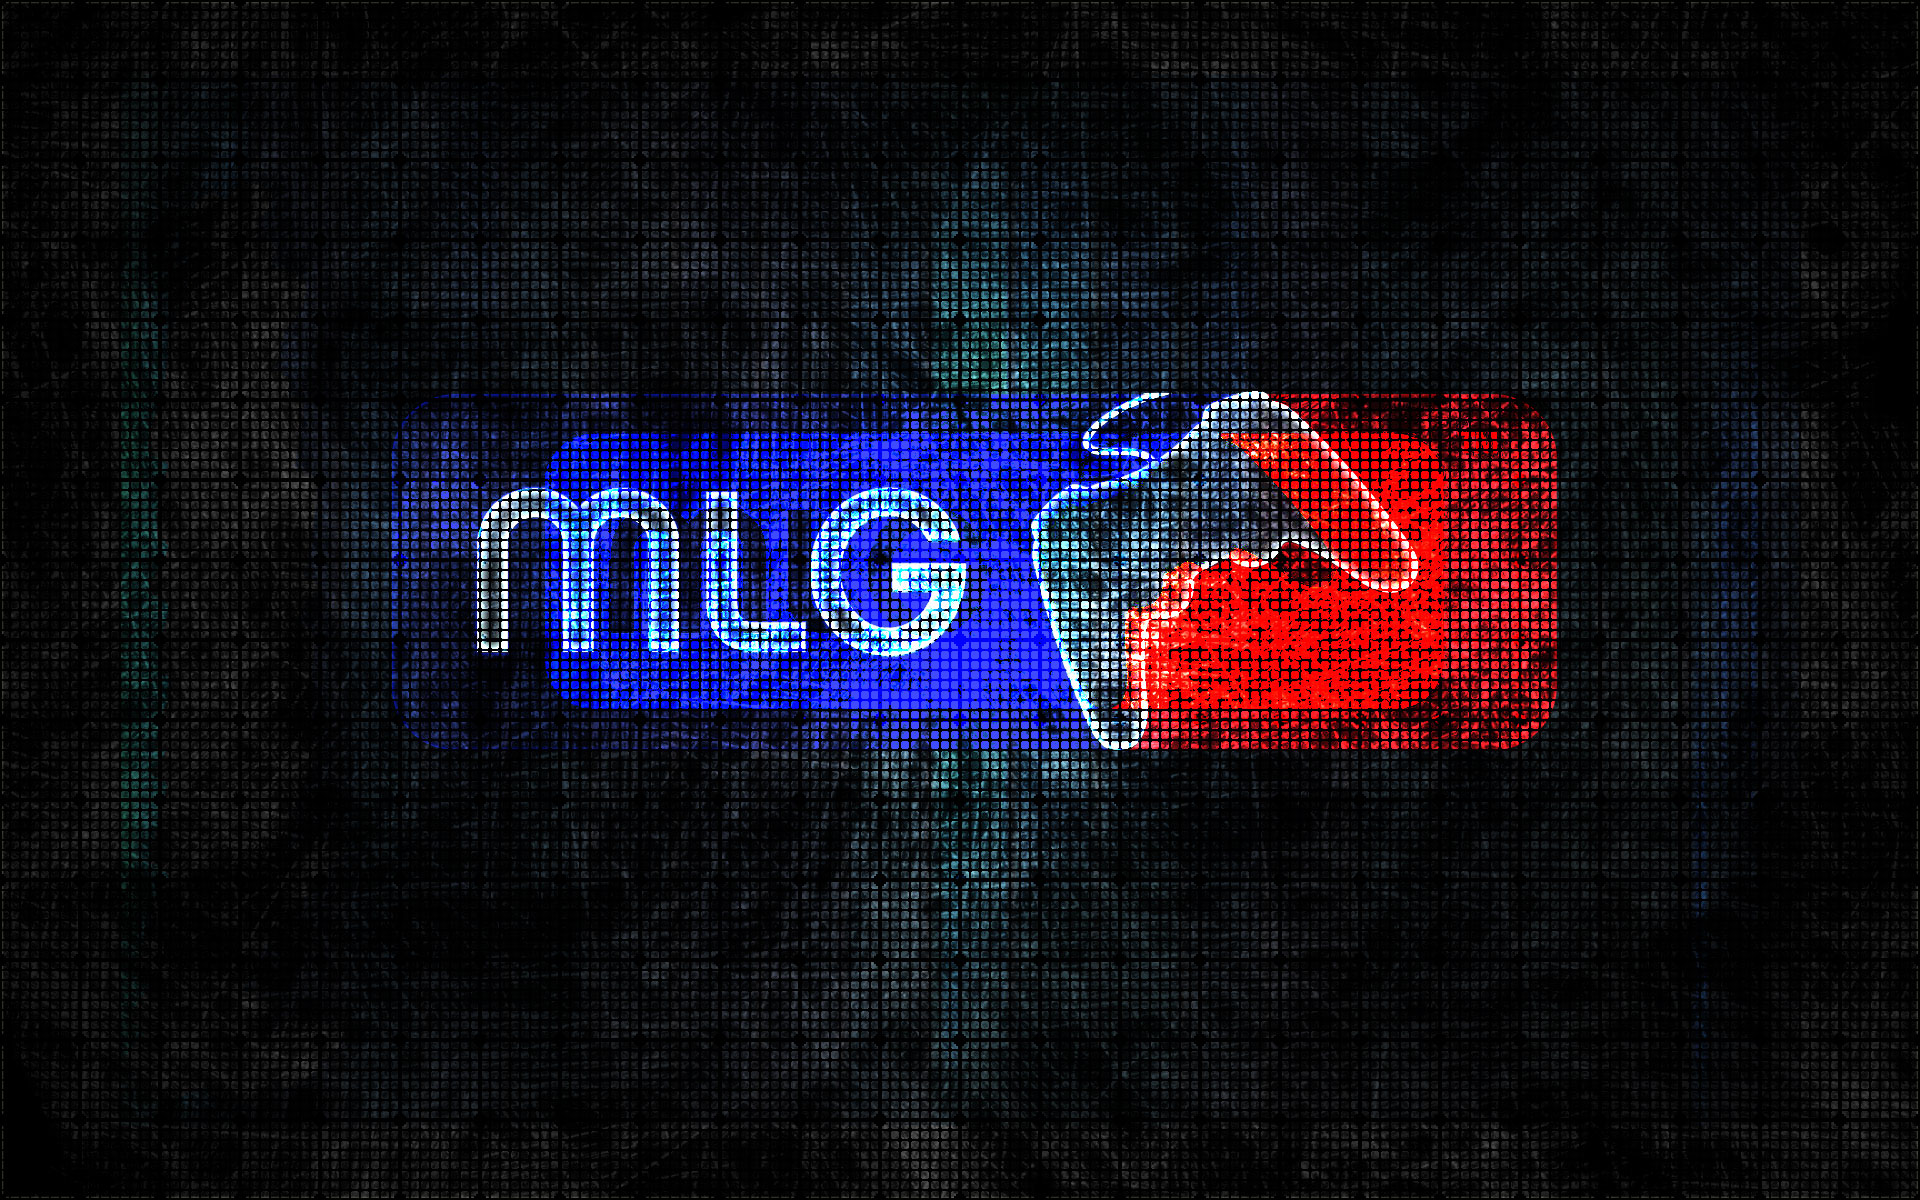 mlg major league gaming HD Wallpaper 1920x1200